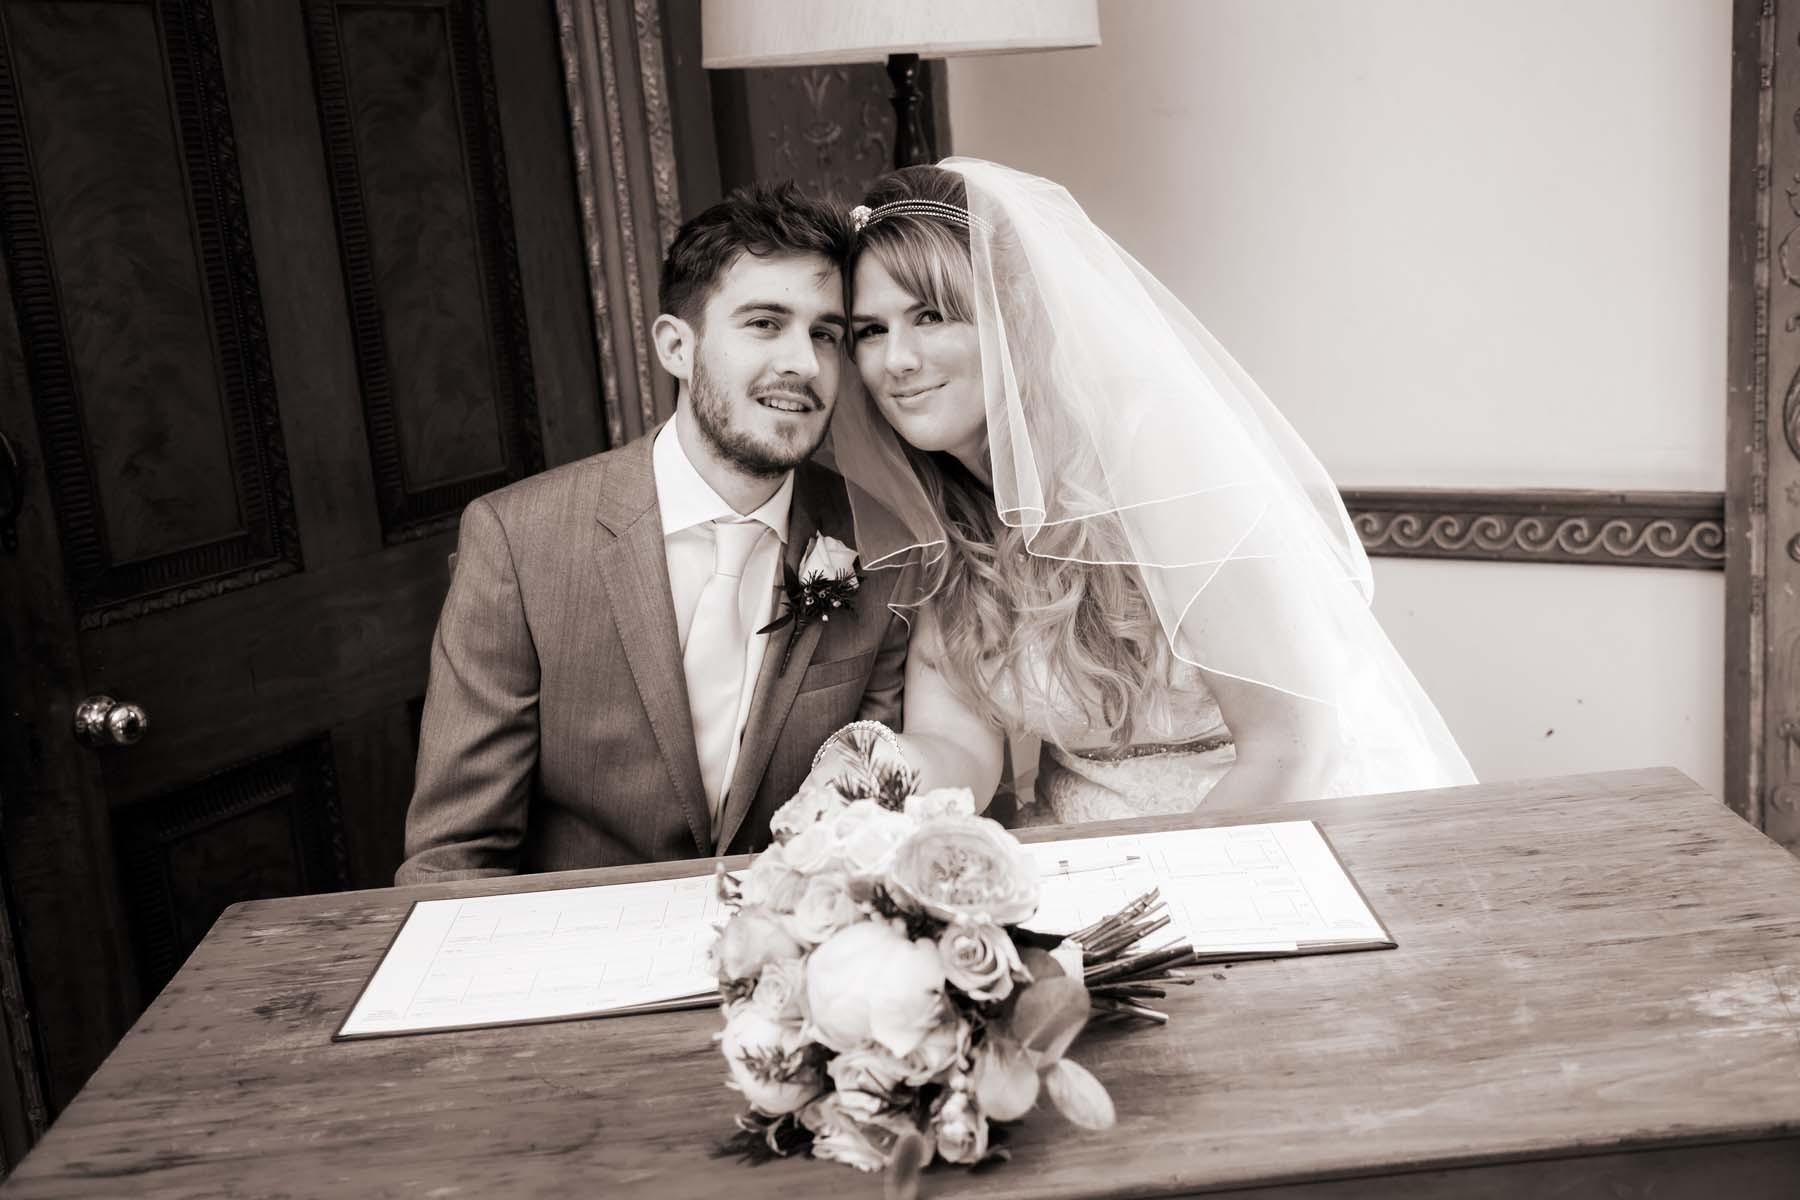 Sussex & Surrey Wedding Photographer - Ceremony (3)